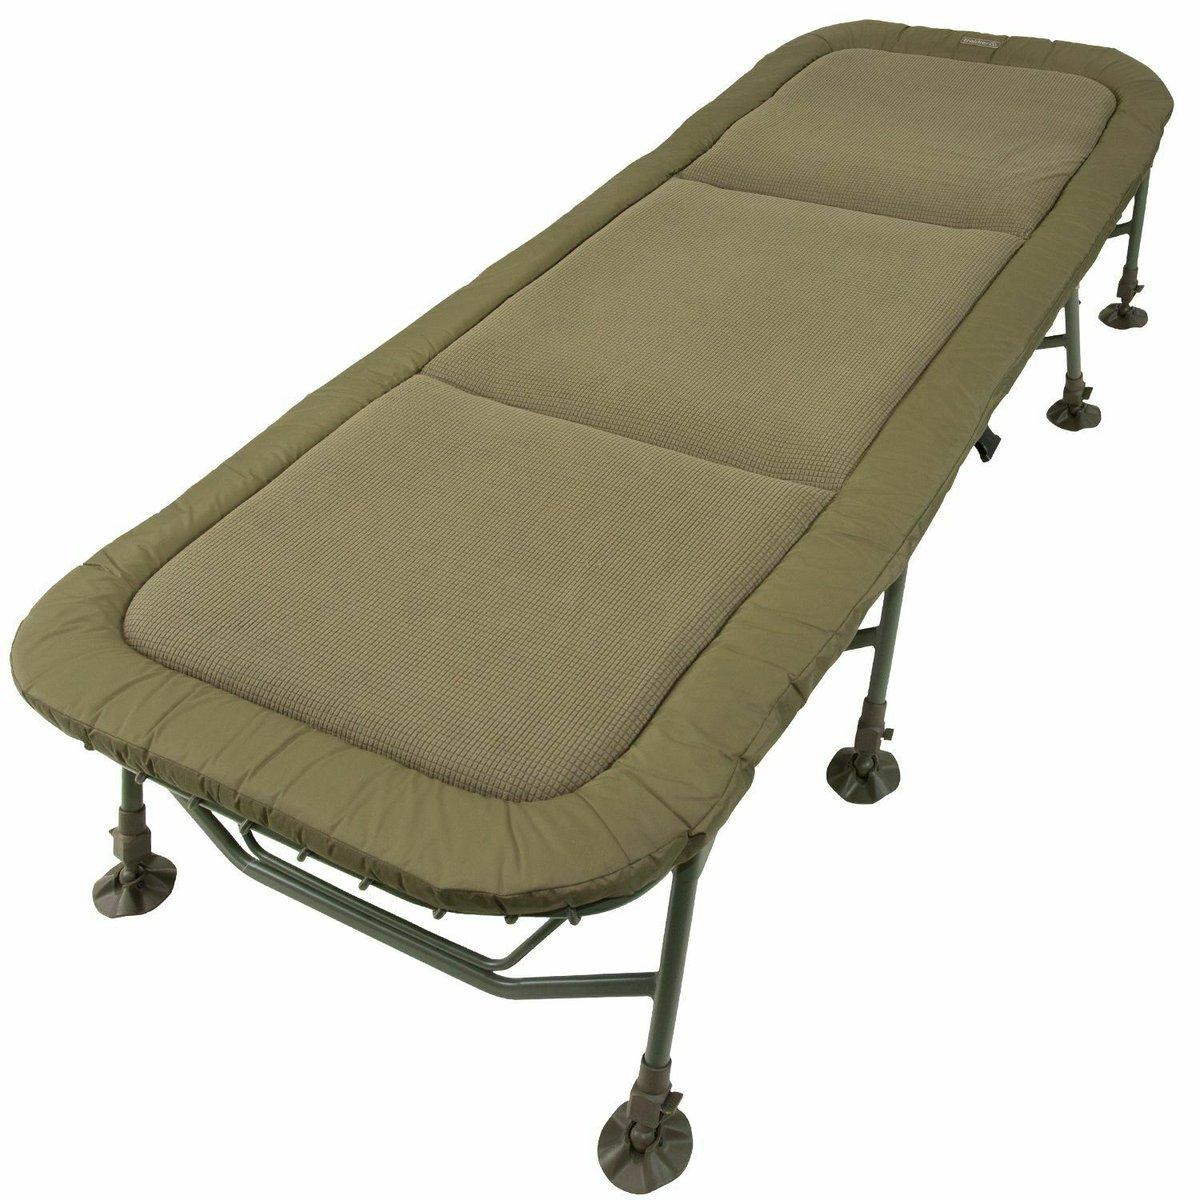 Ad - Trakker RLX 8 Leg Bedchair On eBay here -->> https://t.co/nYET33f8jW  #carpfishing #fishi